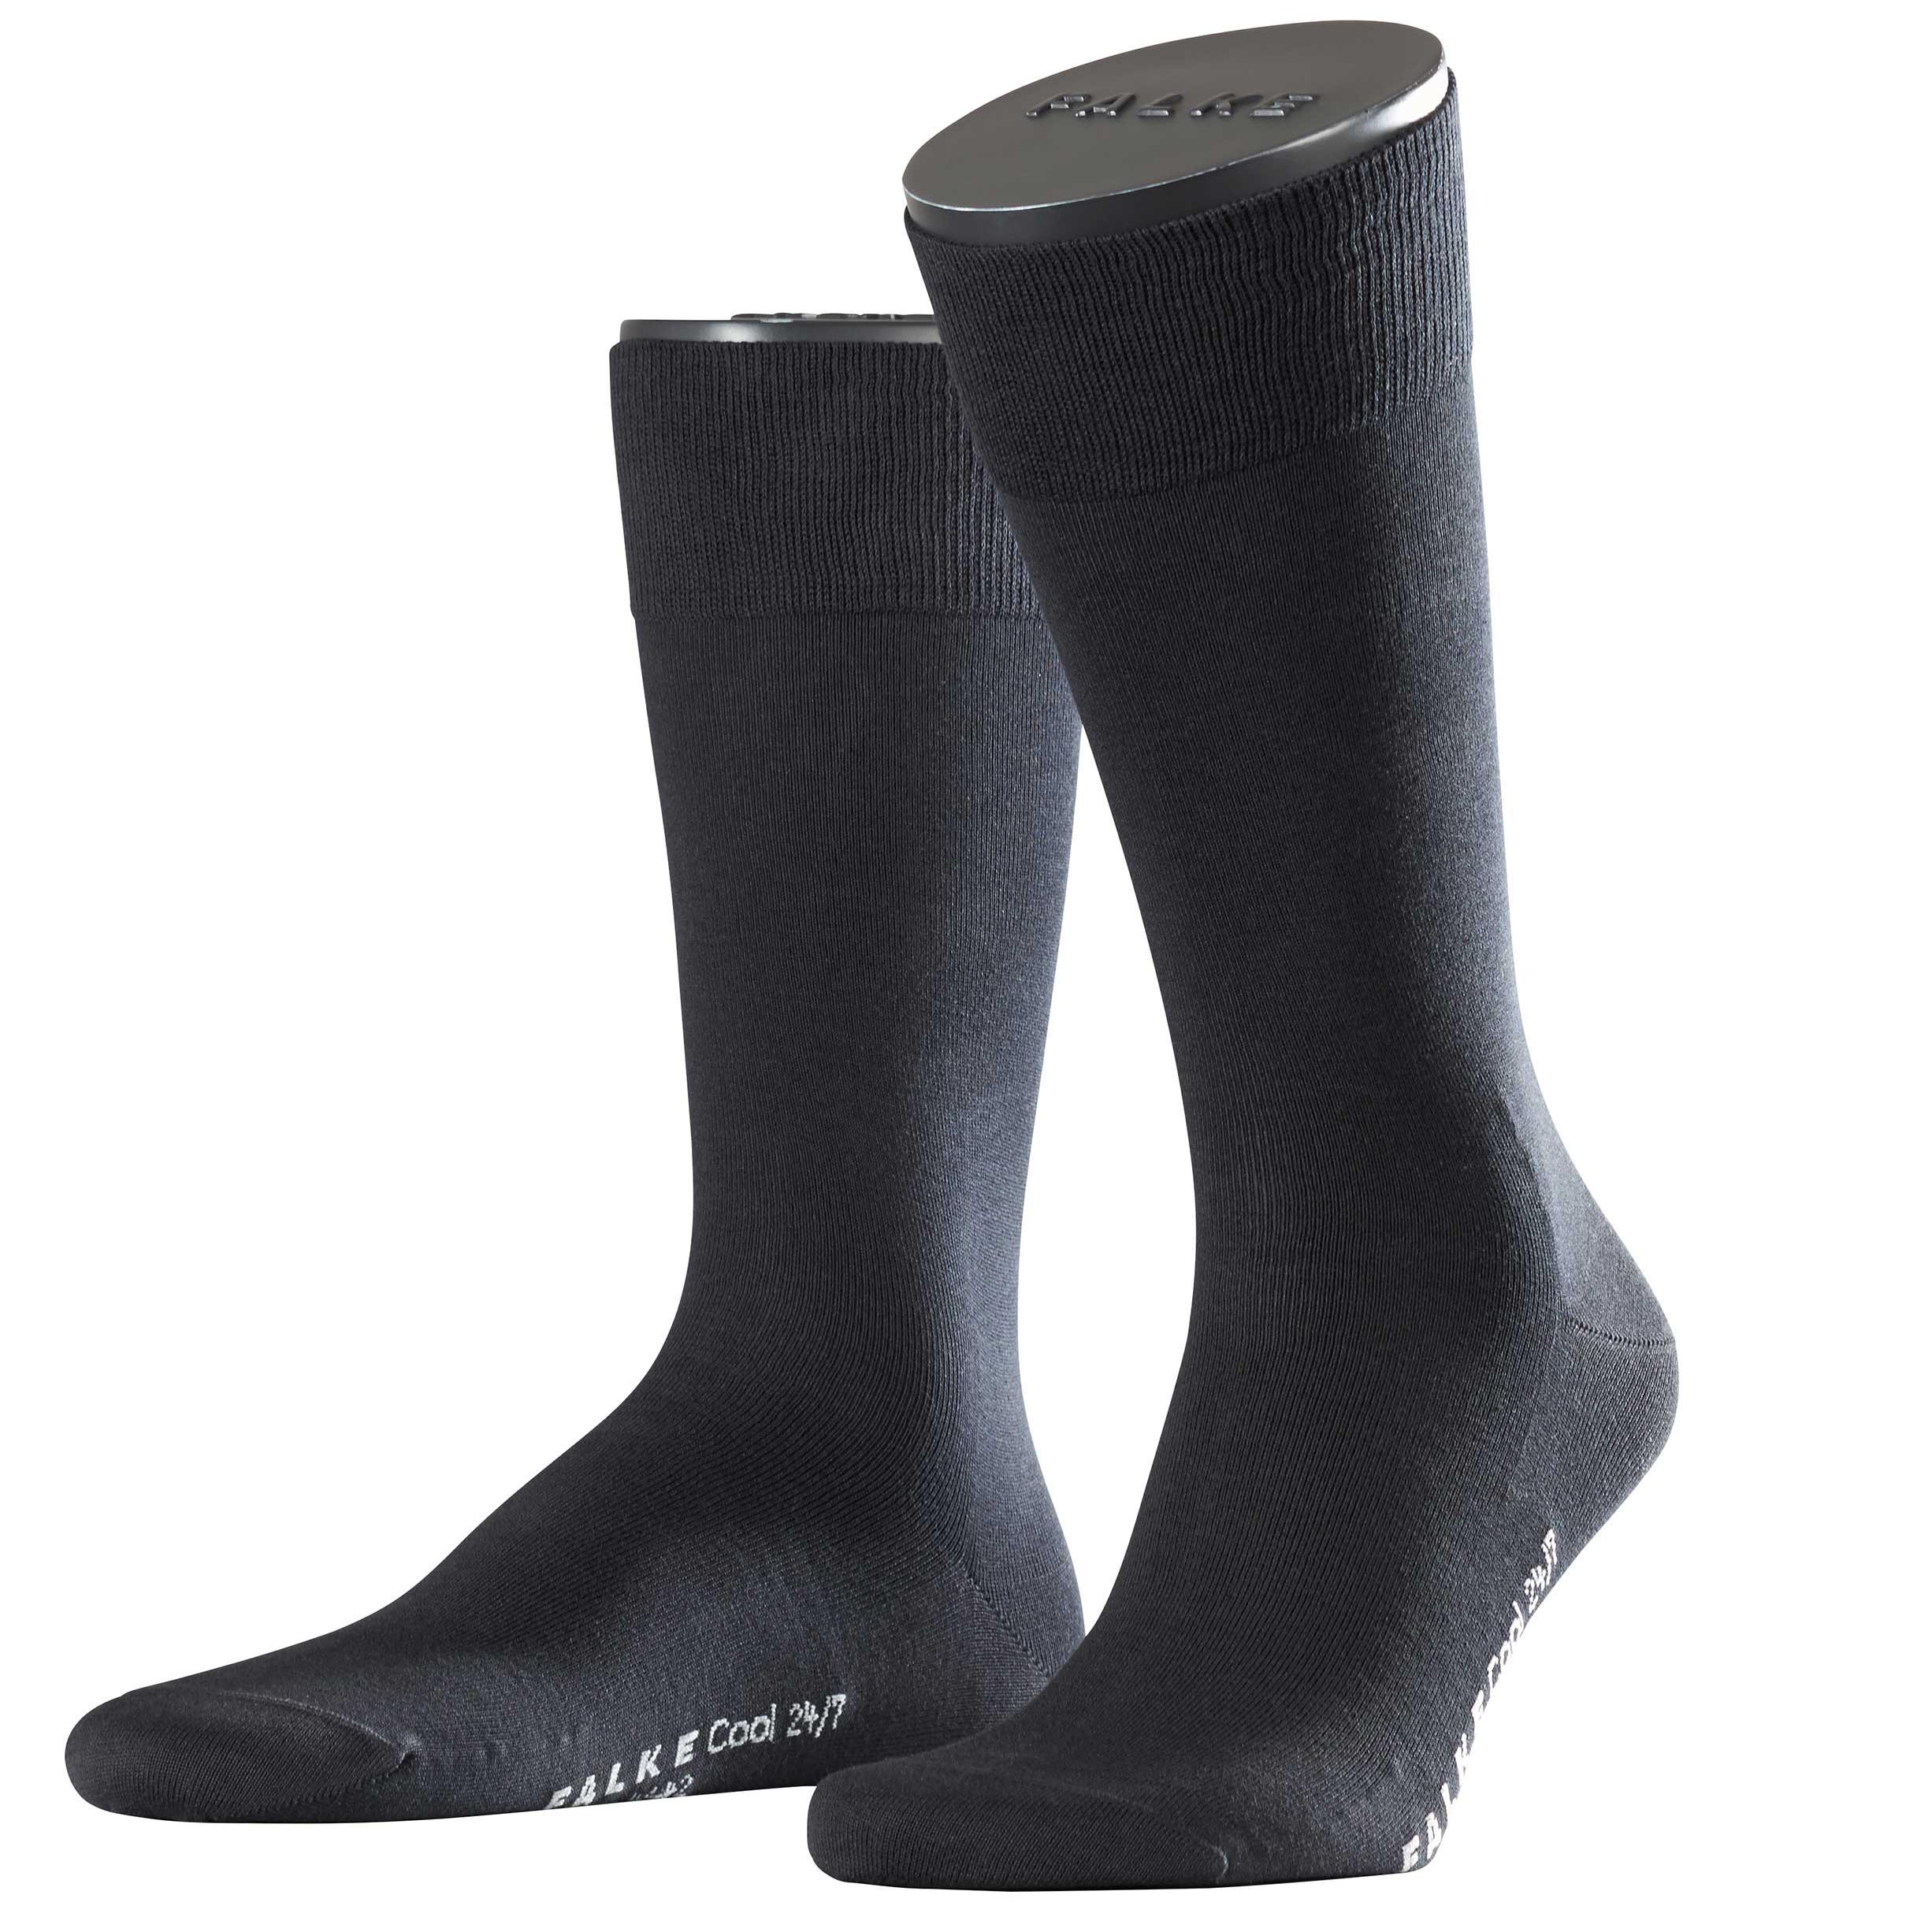 Falke Buisness Socke schwarz 13230 3000 Basic Cool 24/7 Baumwolle